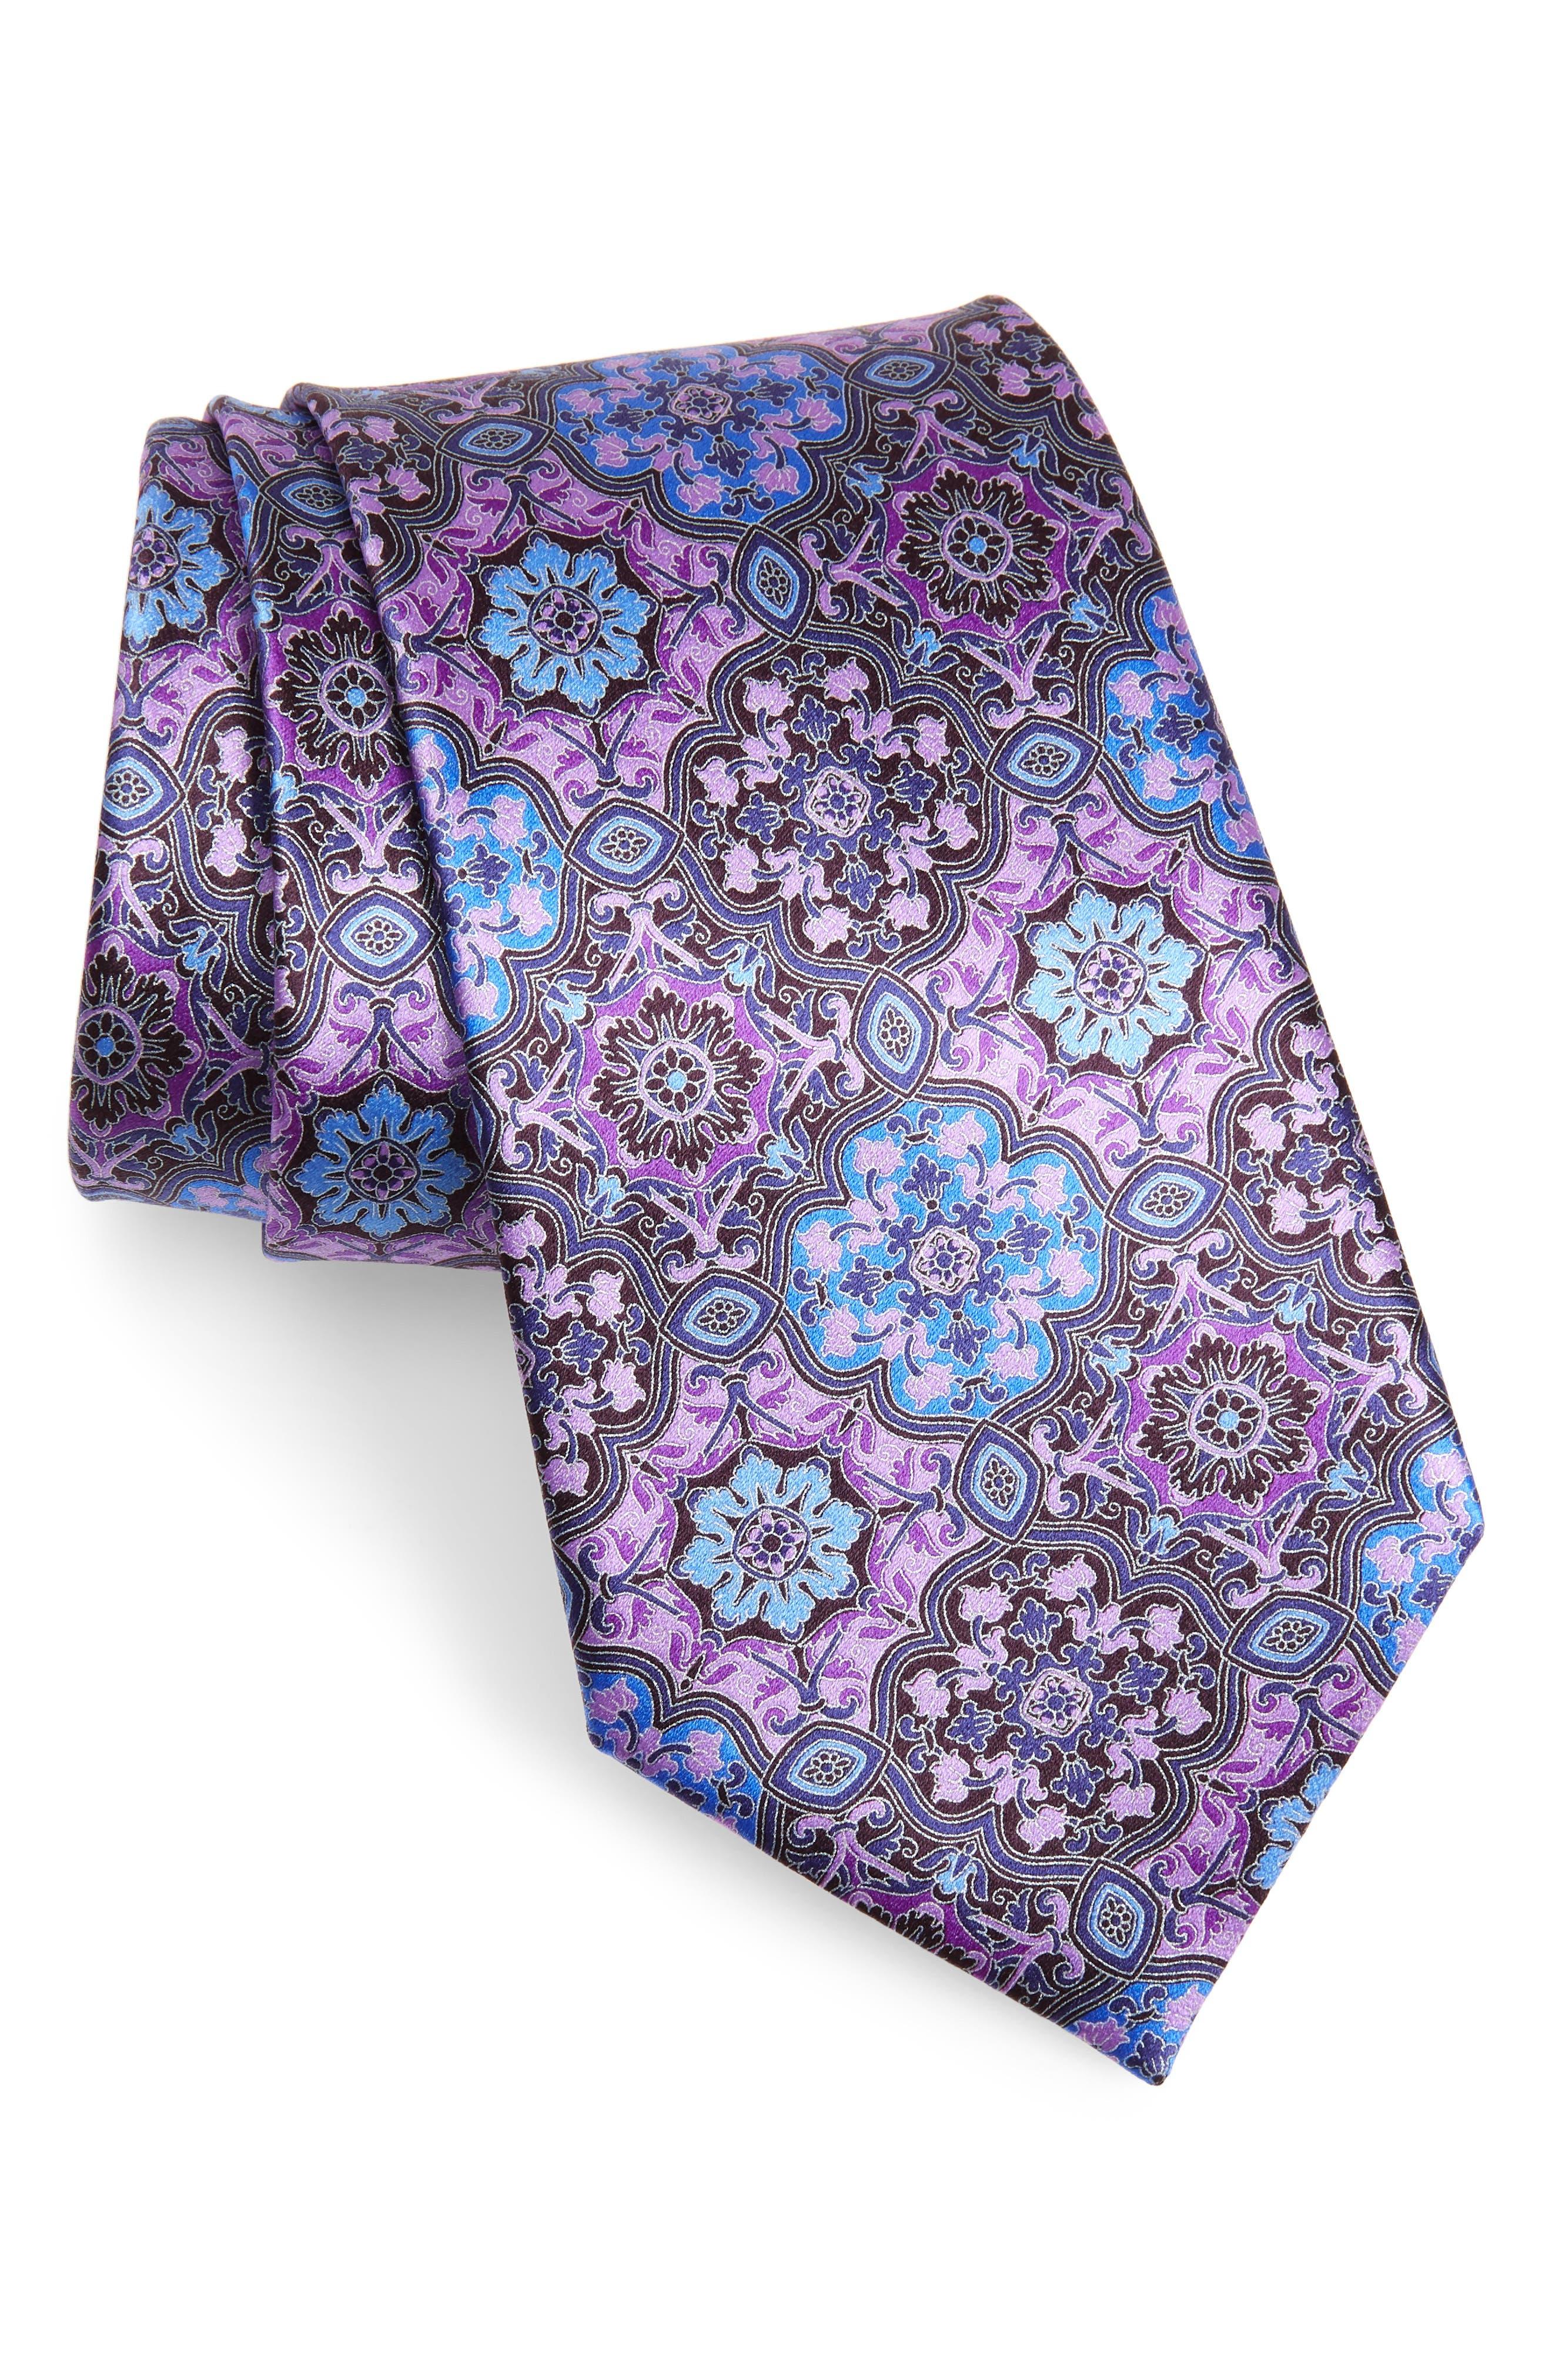 ERMENEGILDO ZEGNA Medallion Silk Tie, Main, color, PURPLE